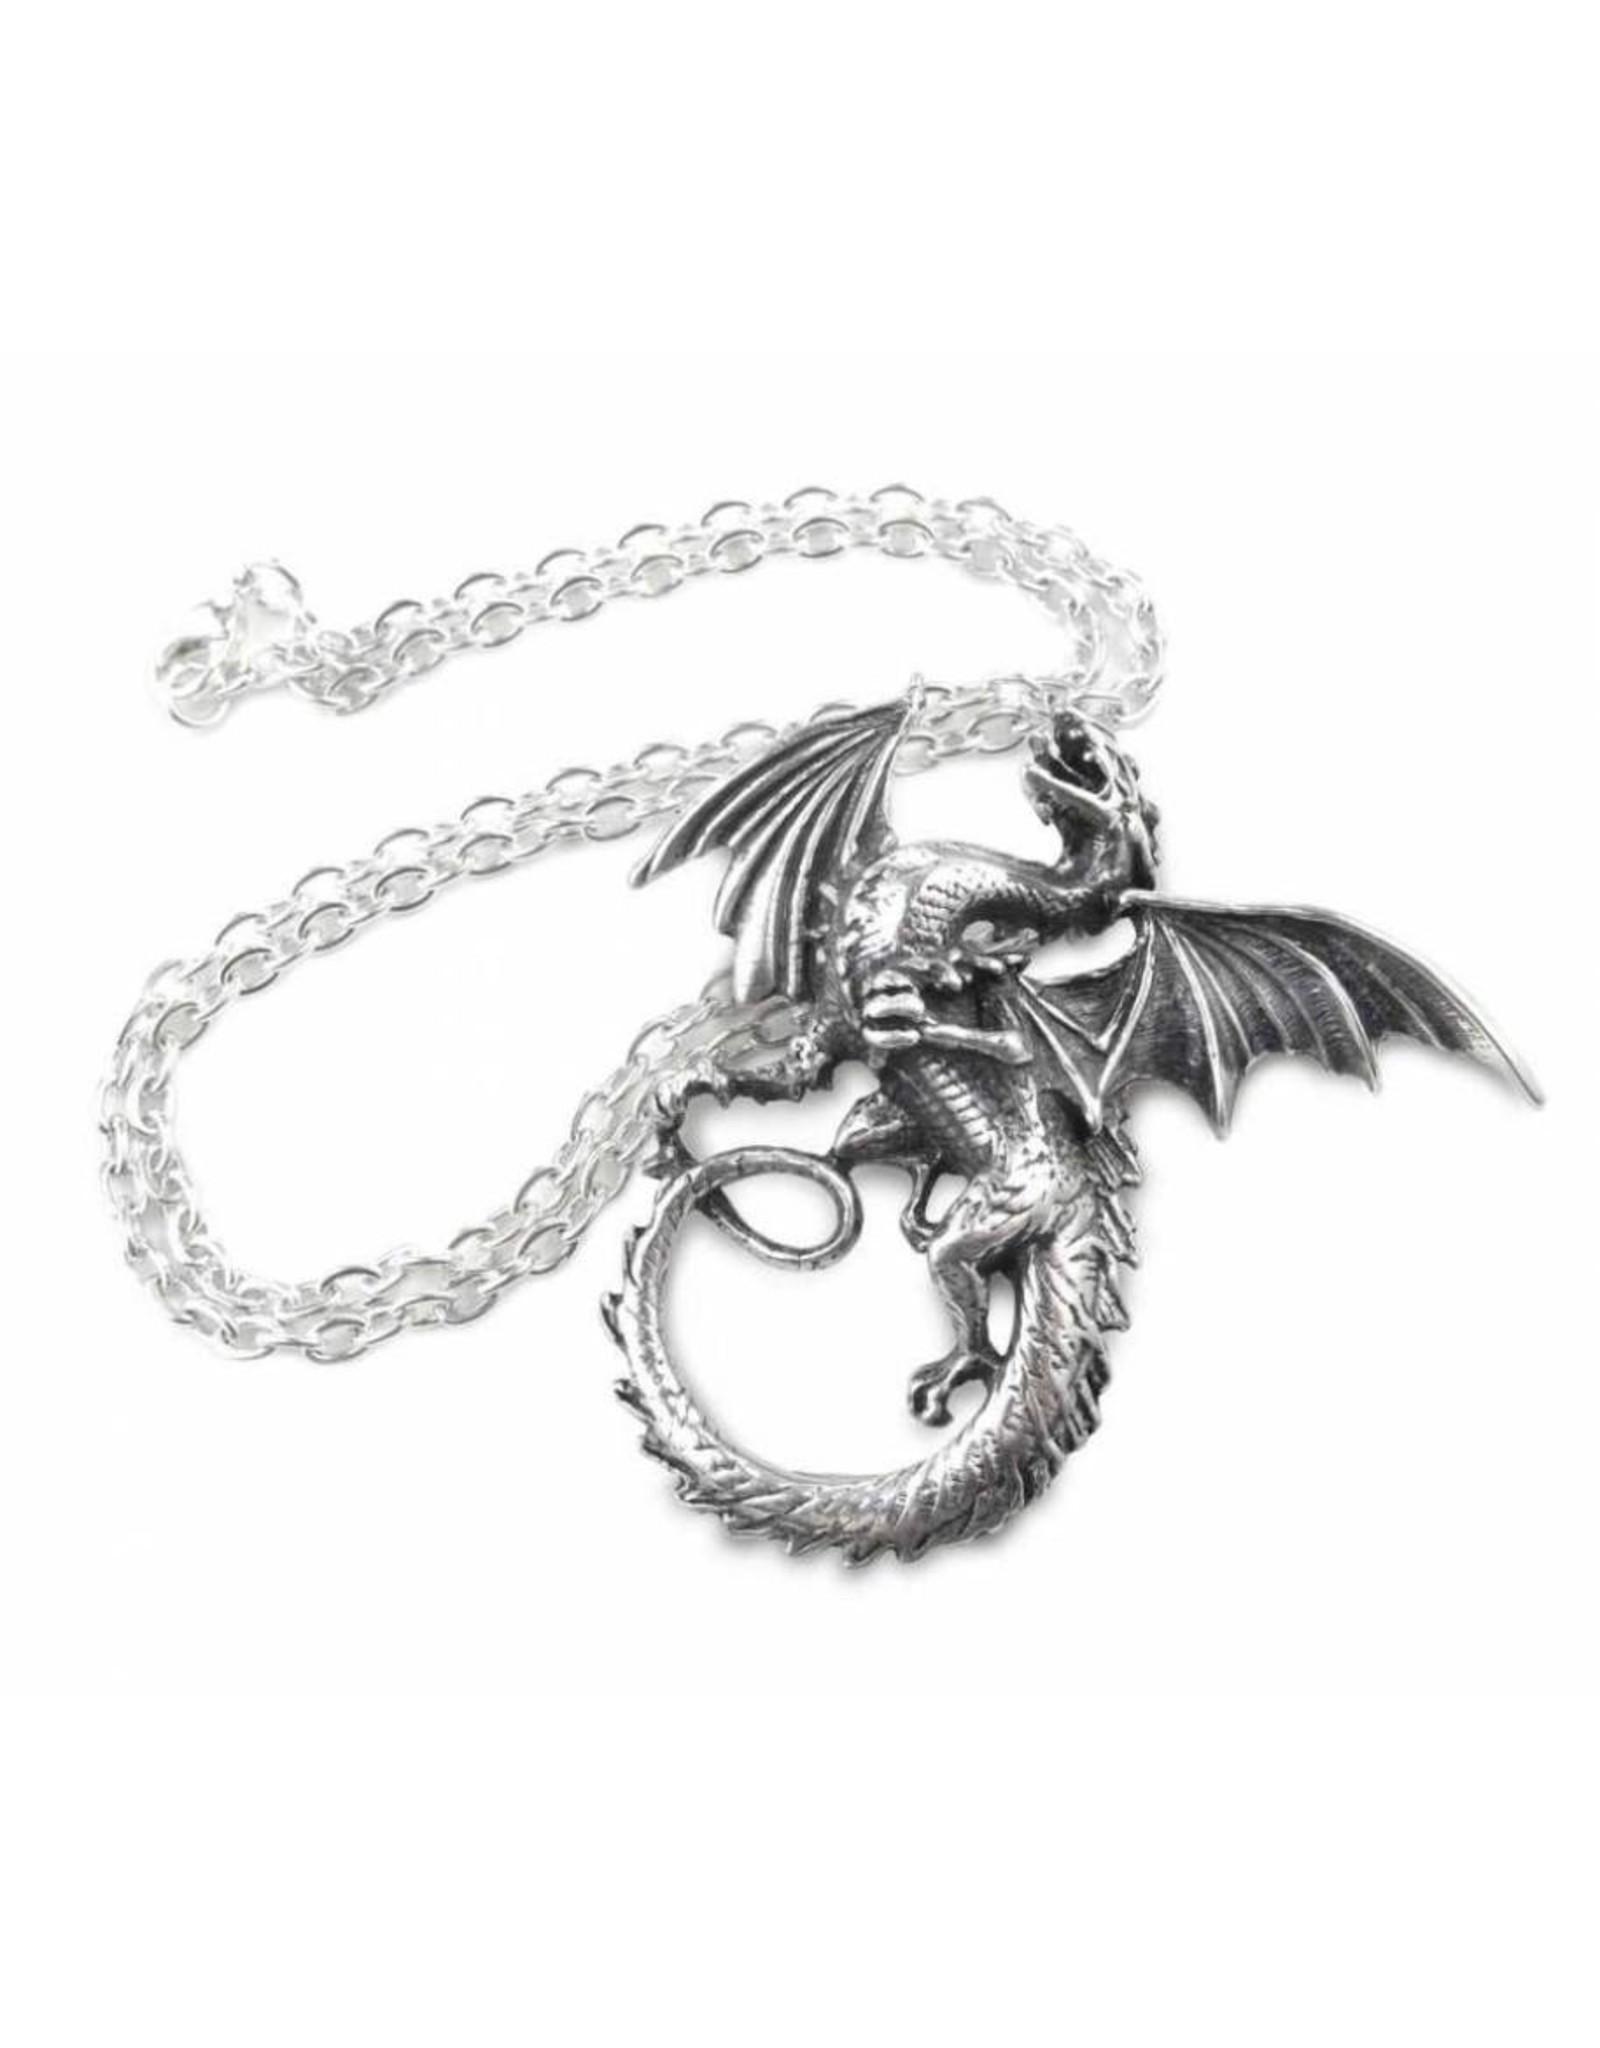 Alchemy Gothic accessoires - The Whitby Wyrm hanger en ketting  Alchemy